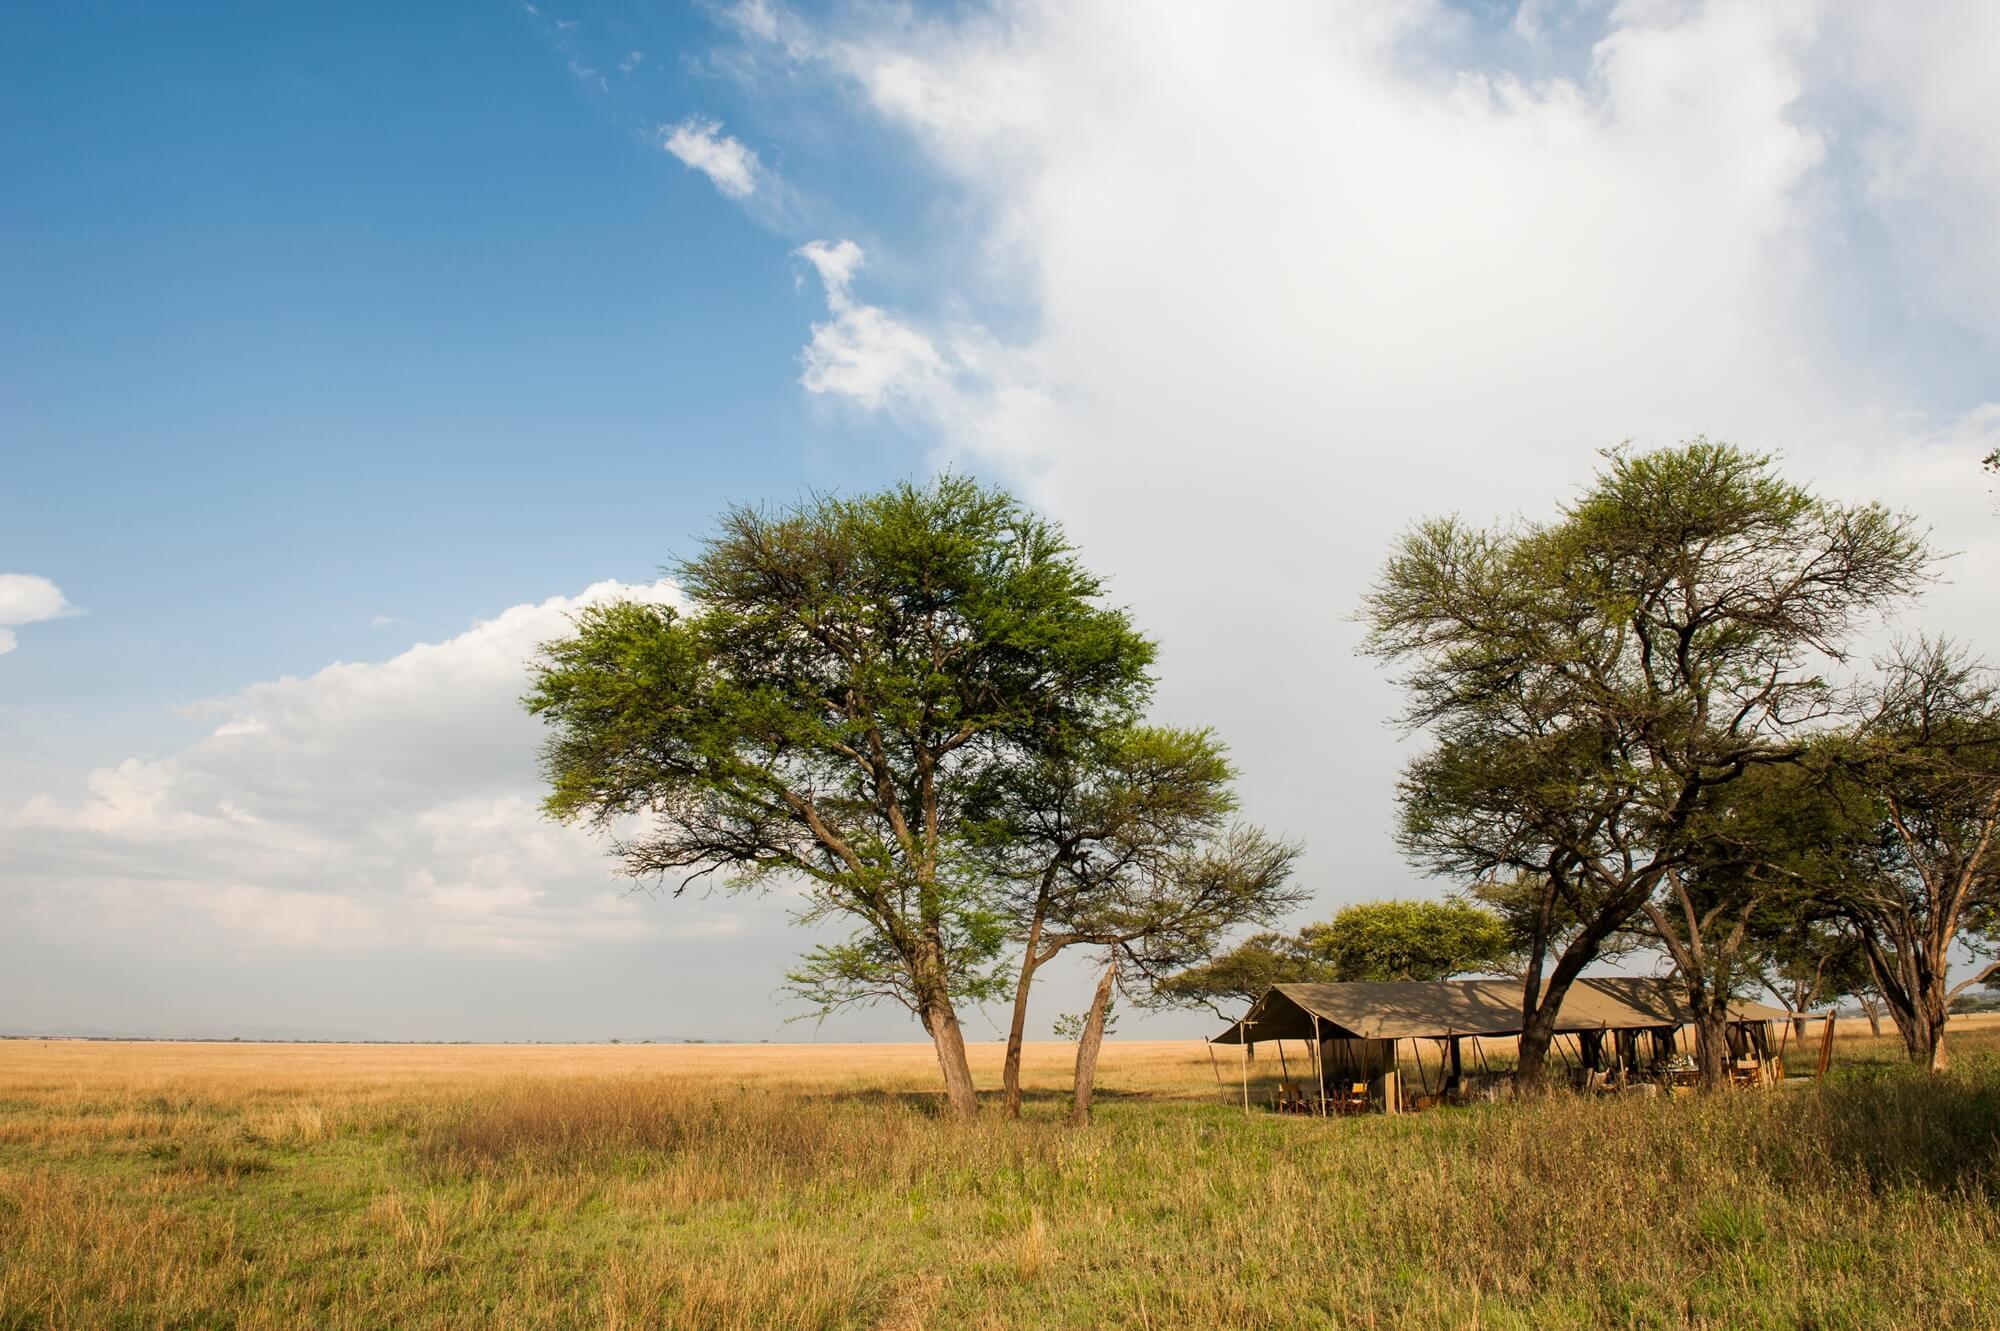 Nomad's Serengeti Safari Camp Grumeti